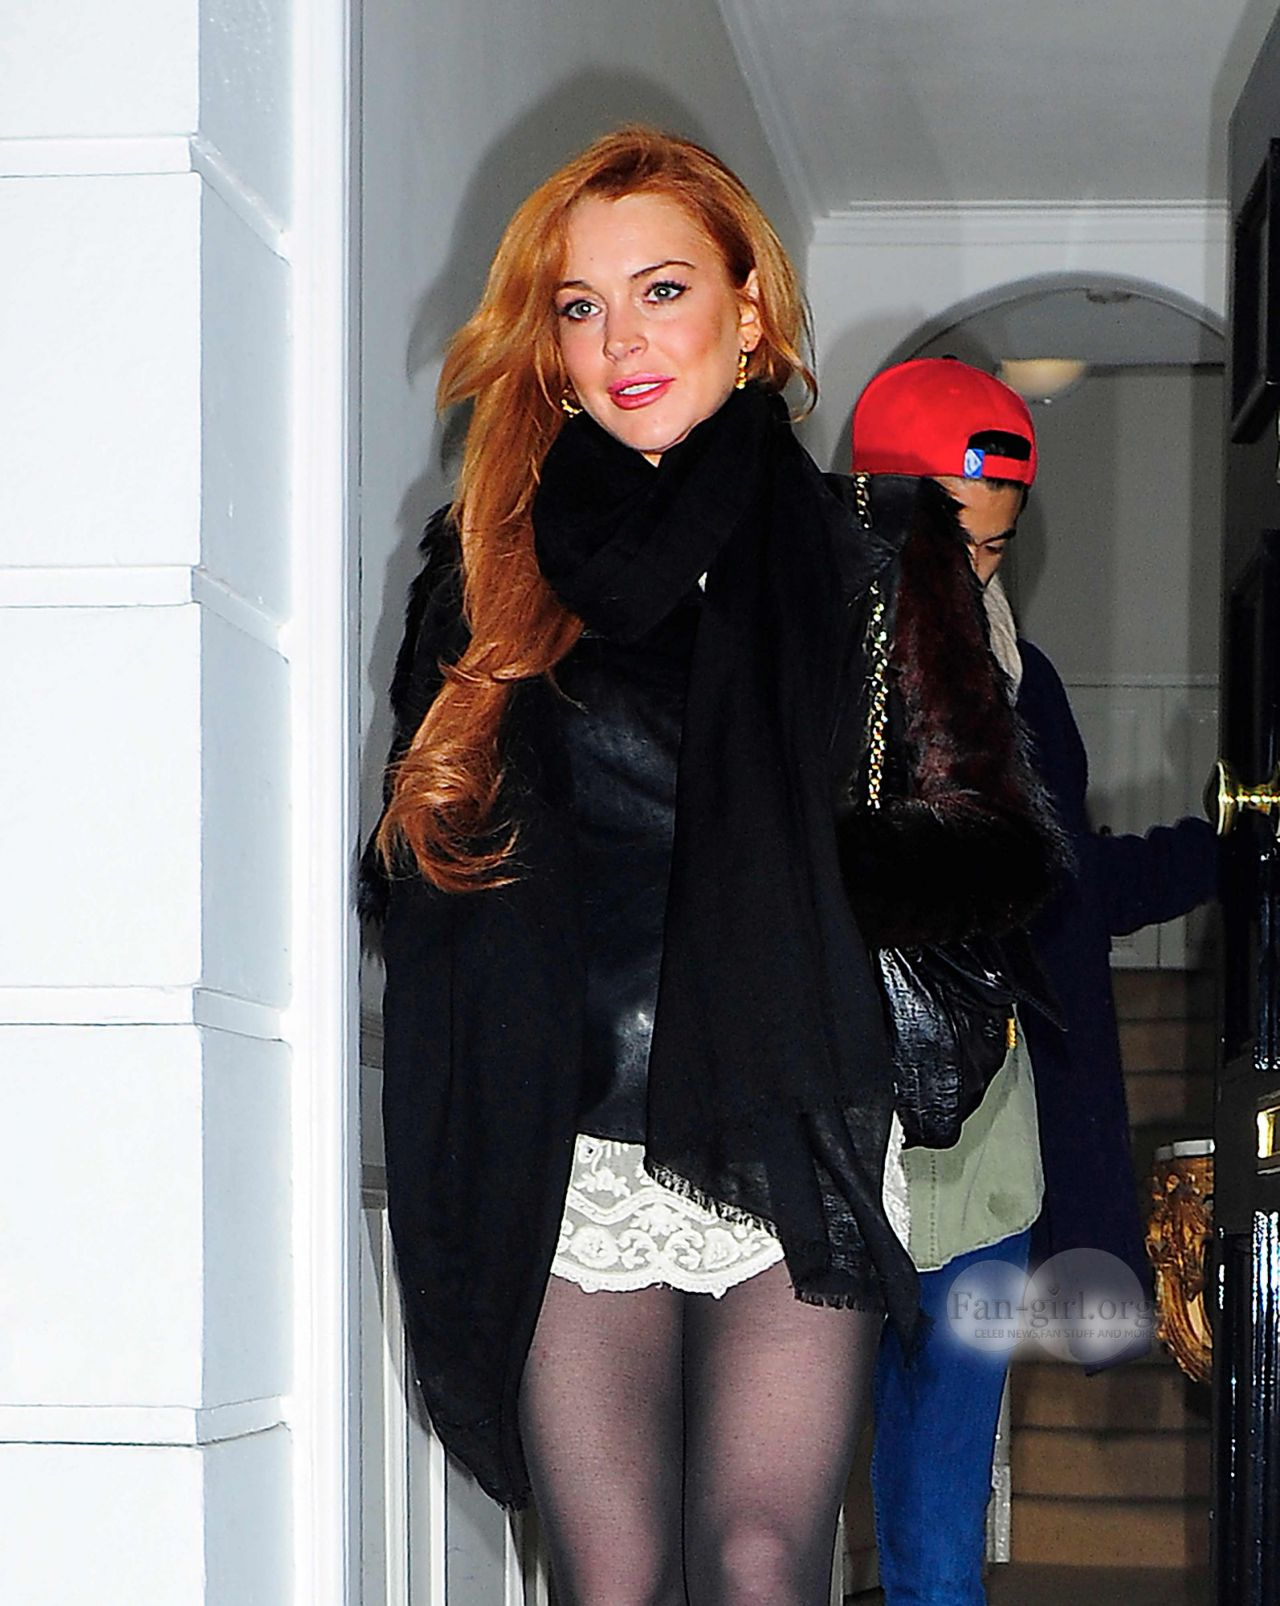 That lindsay lohan mini skirt